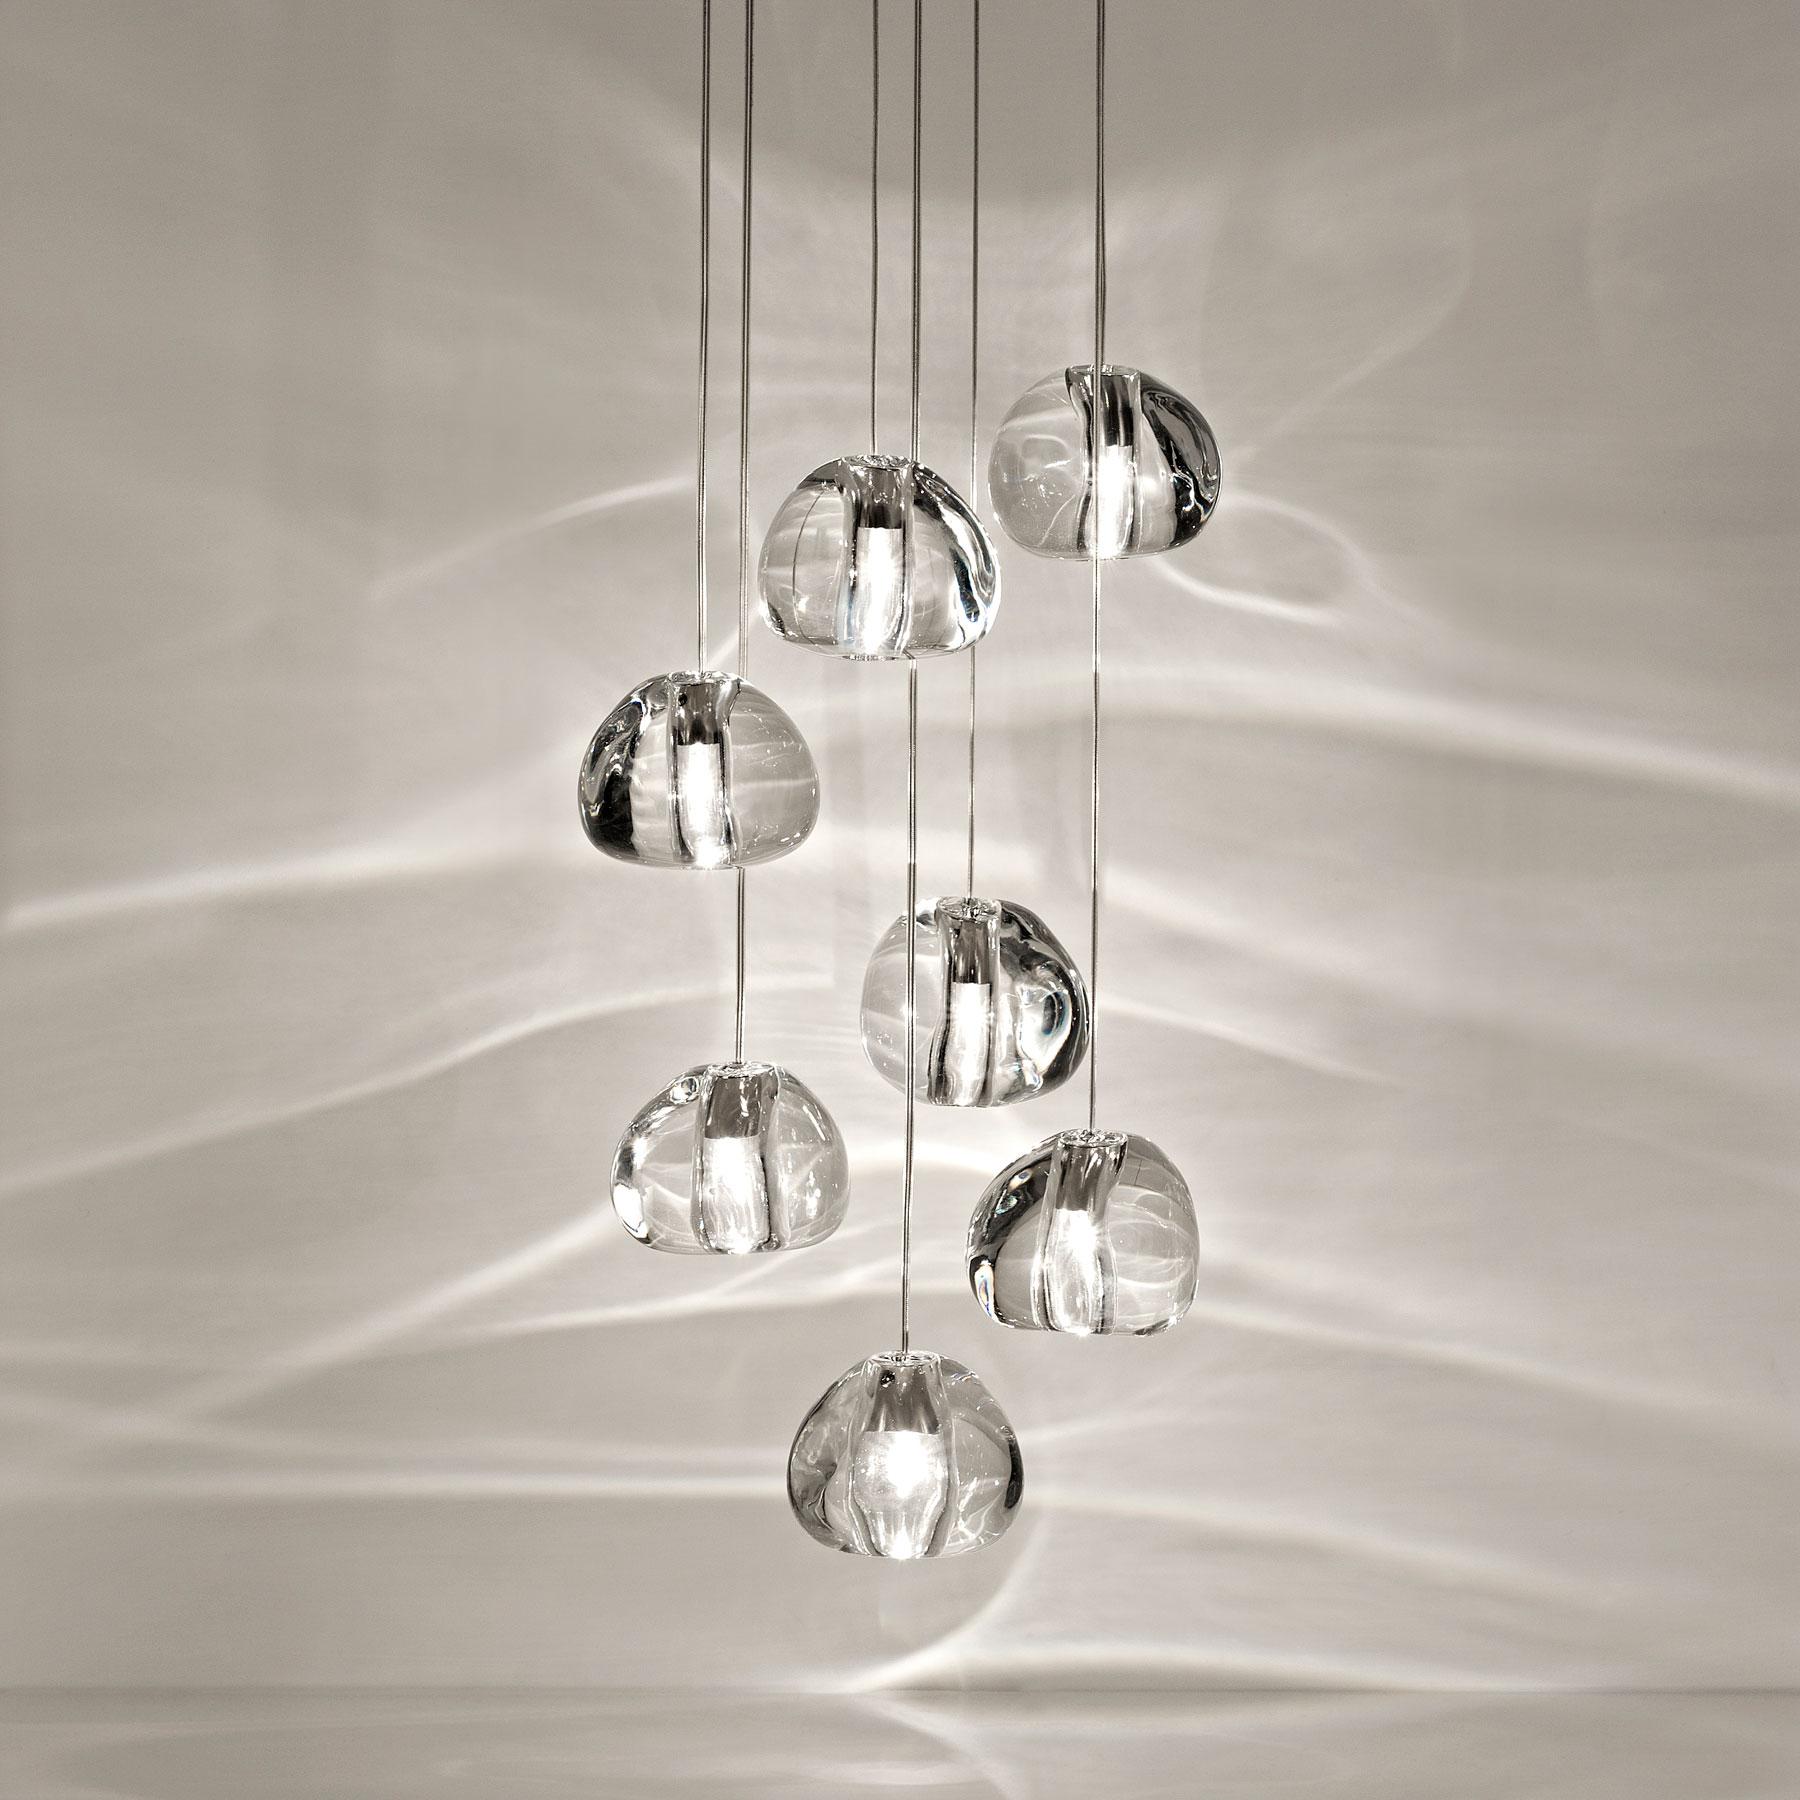 Mizu crystal glass chandelier landscape lamps led lighting from mizu crystal glass chandelier landscape lamps led lighting 5317101 arubaitofo Image collections